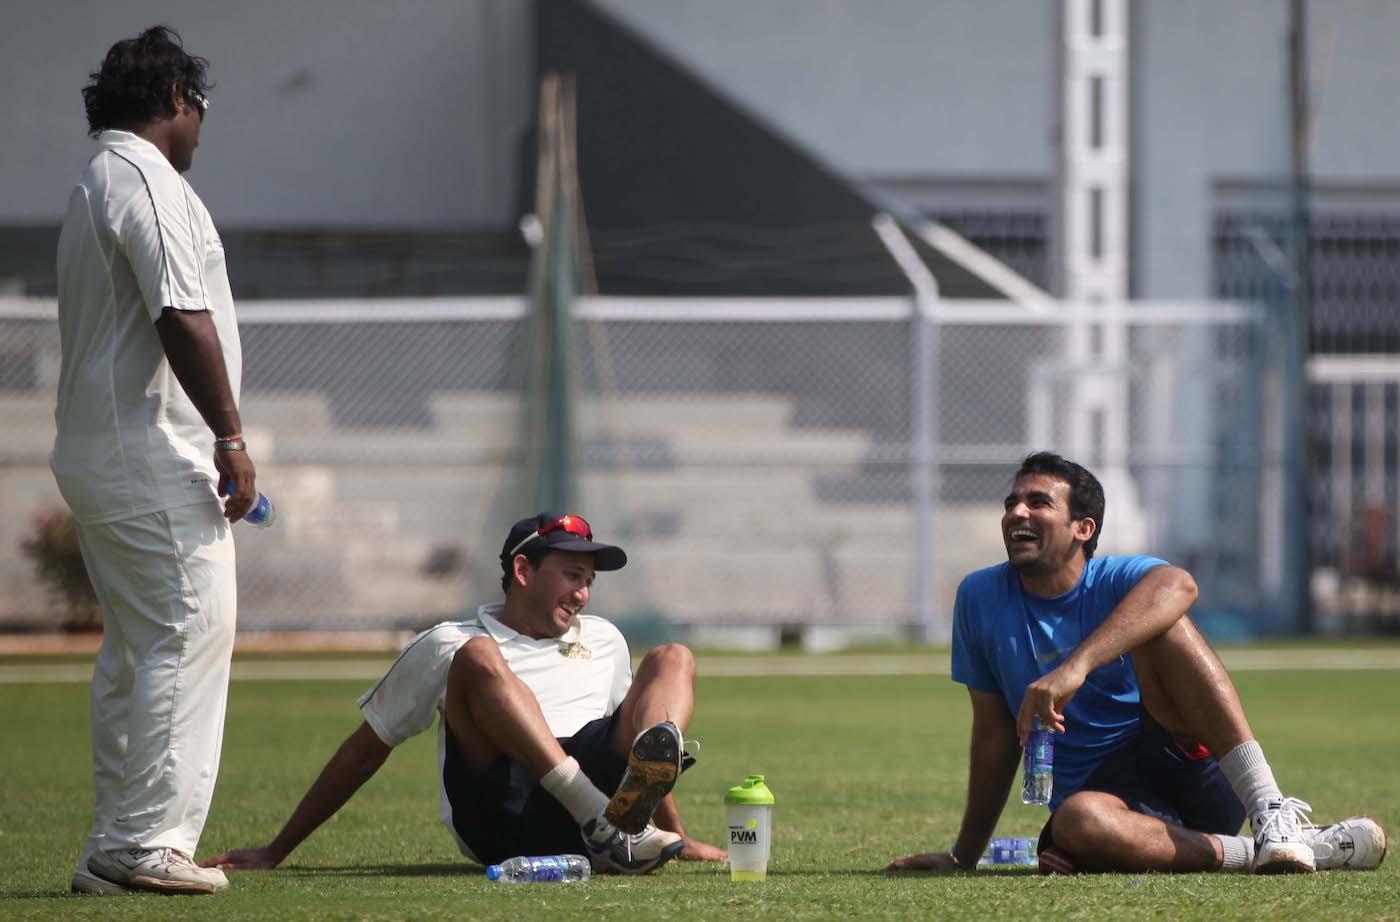 A pugnacious spinner, a bowling captain and an engineering mind for Mumbai in Ramesh Powar, Ajit Agarkar and Zaheer Khan